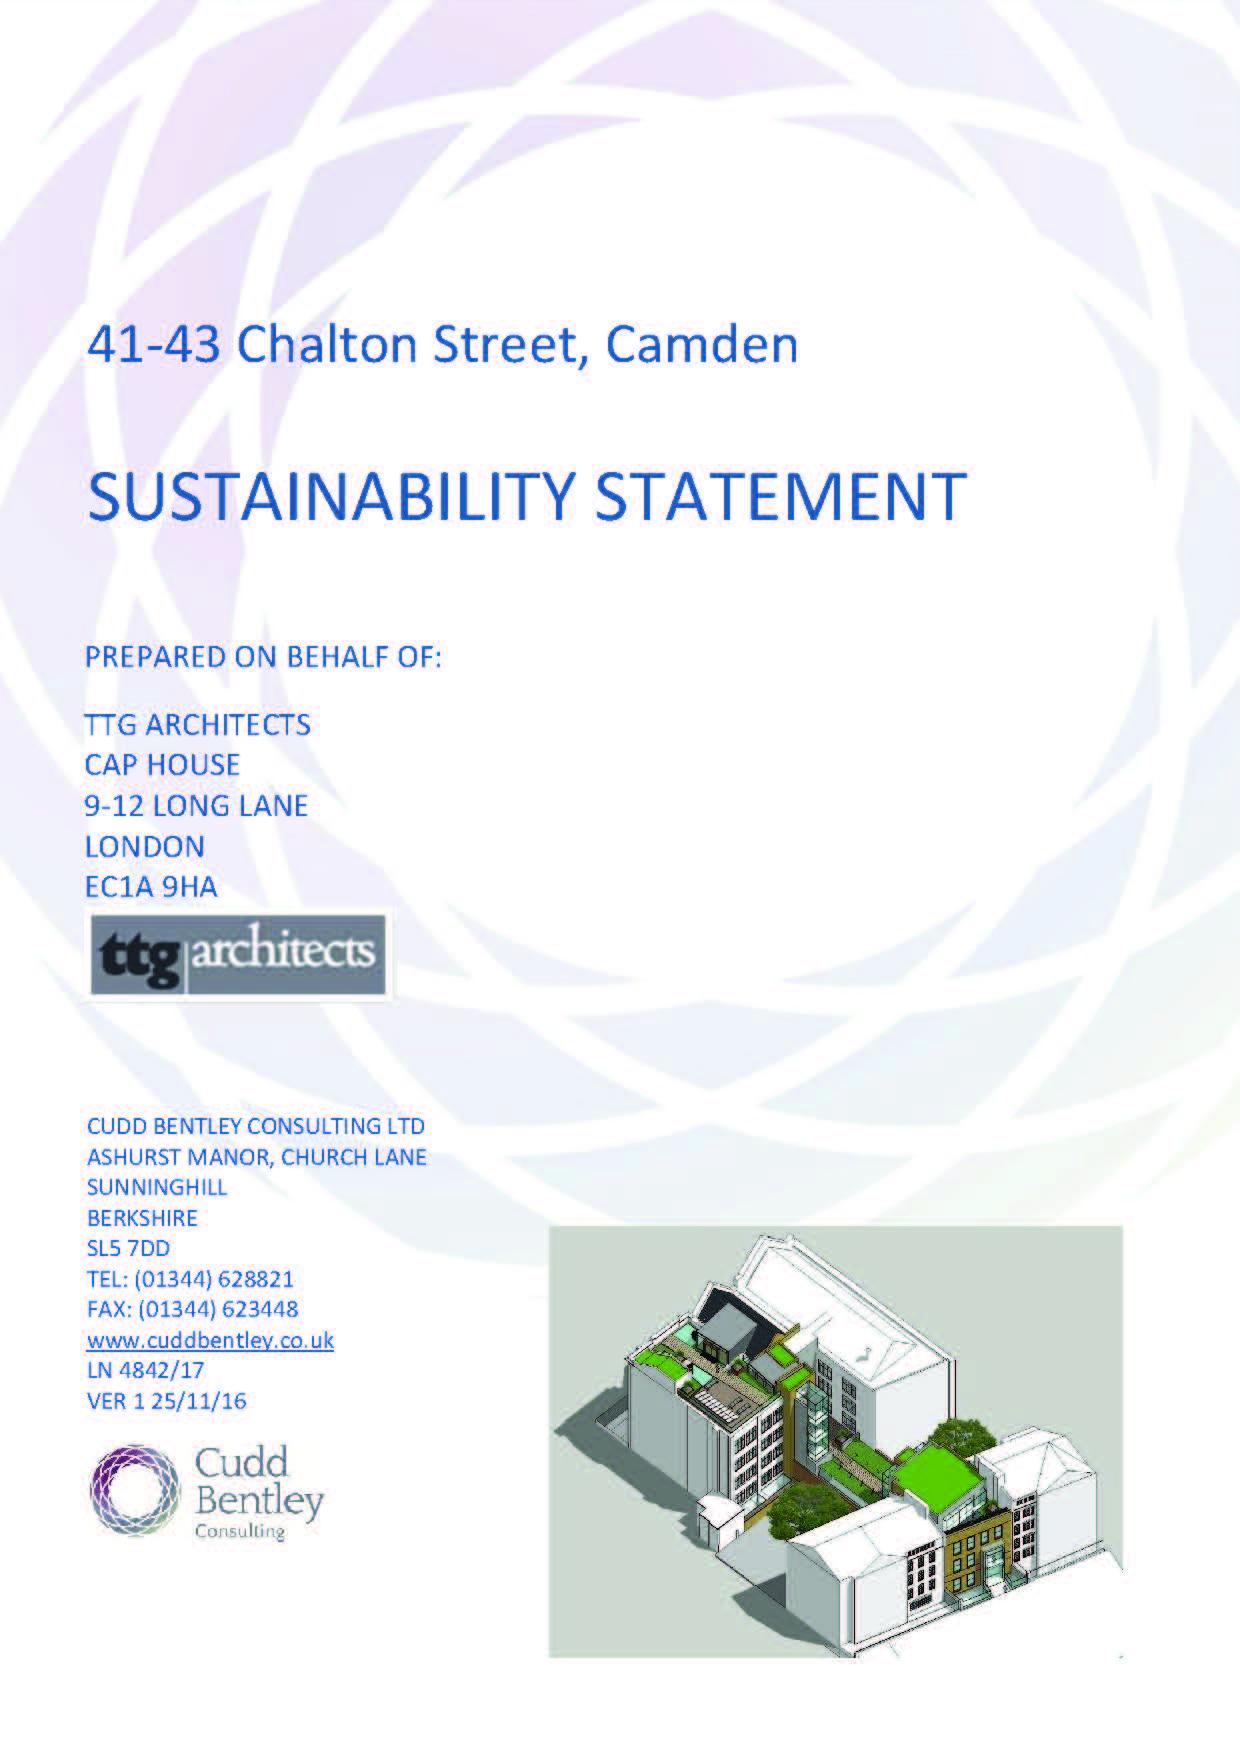 41-43 Charlton Street, Camden